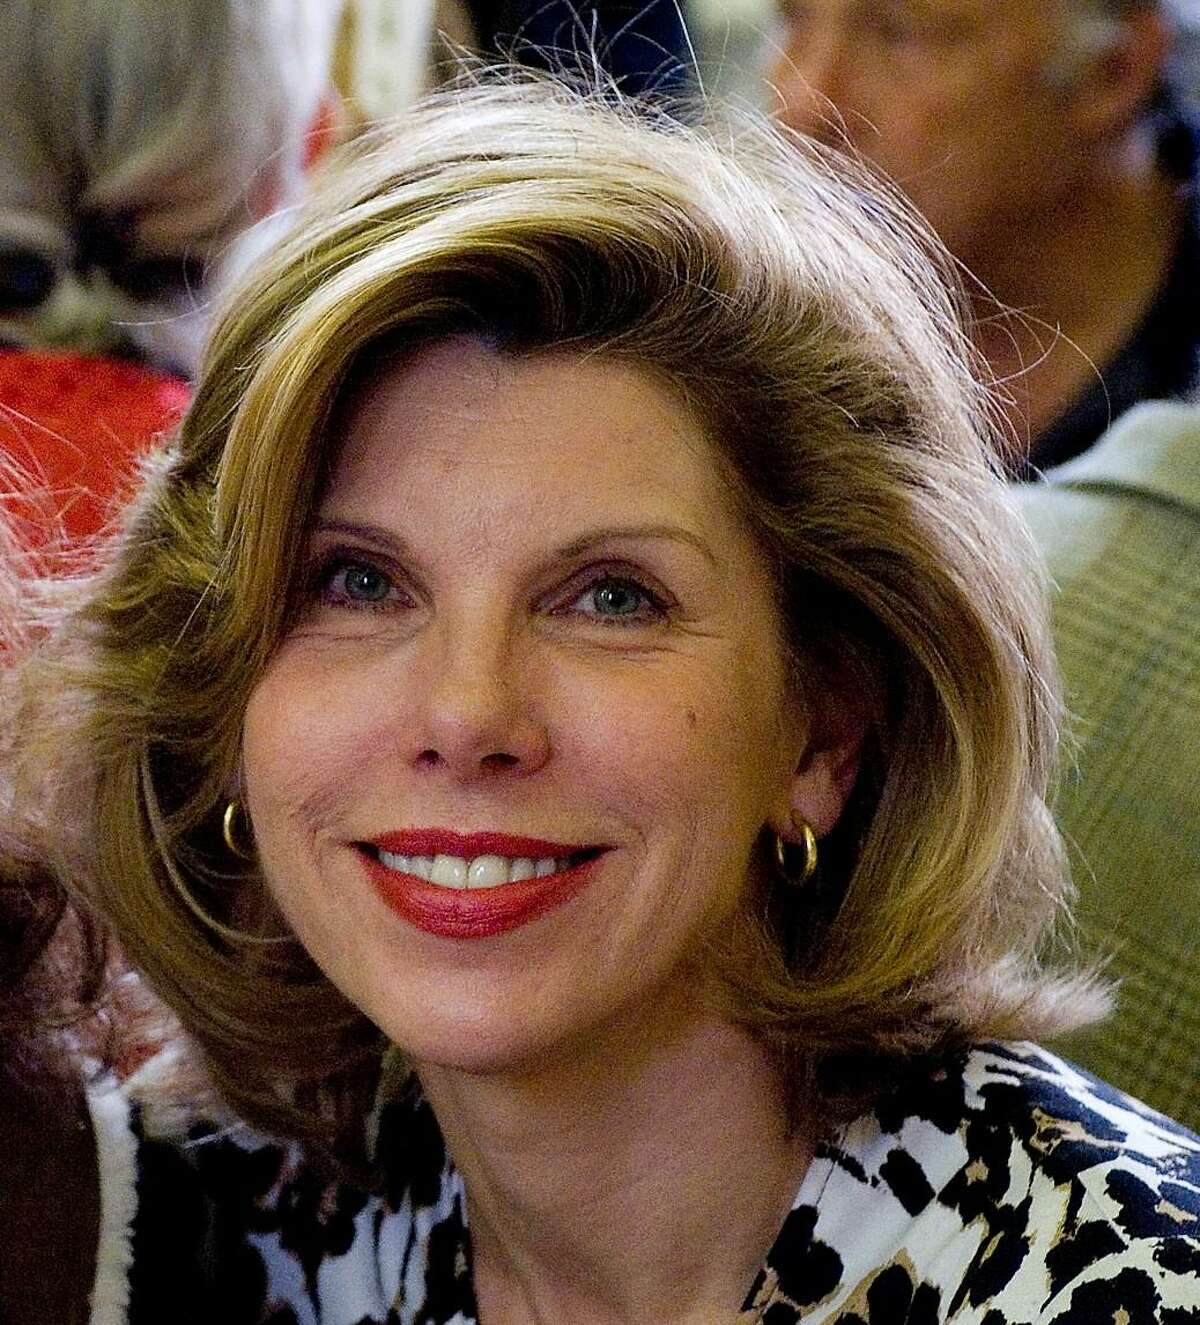 Christine Baranski will host HVA's virtual Auction for the Environment from 4-5 p.m., Sunday.